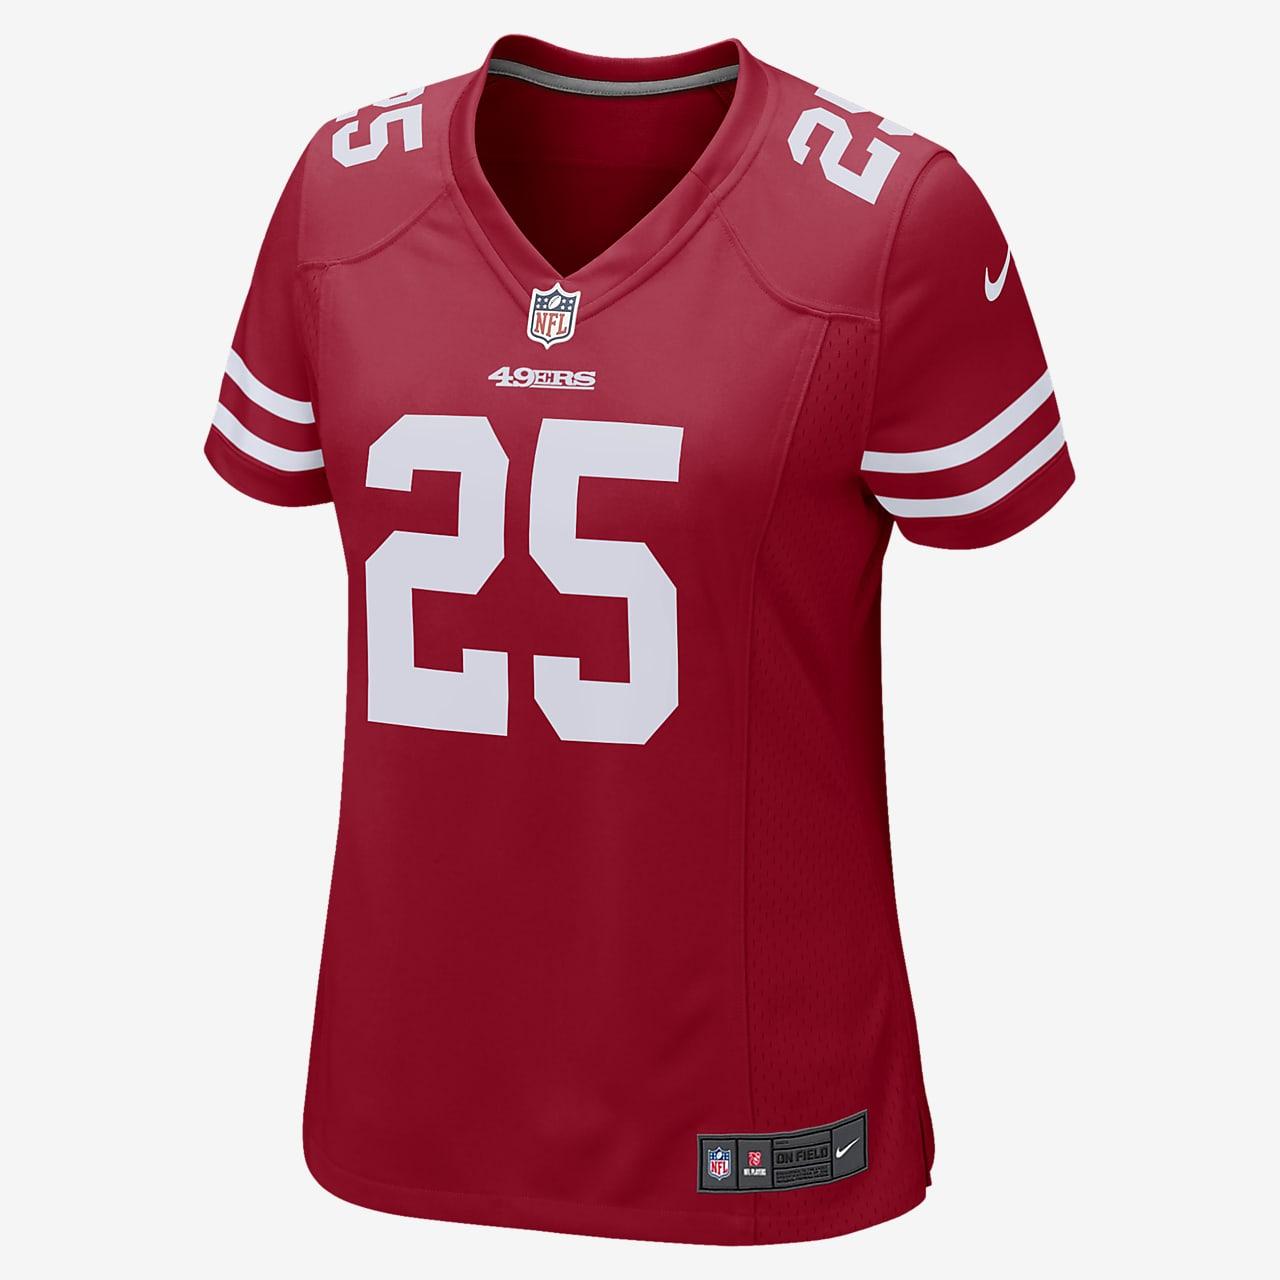 NFL San Francisco 49ers (Richard Sherman) Men's Game Football Jersey